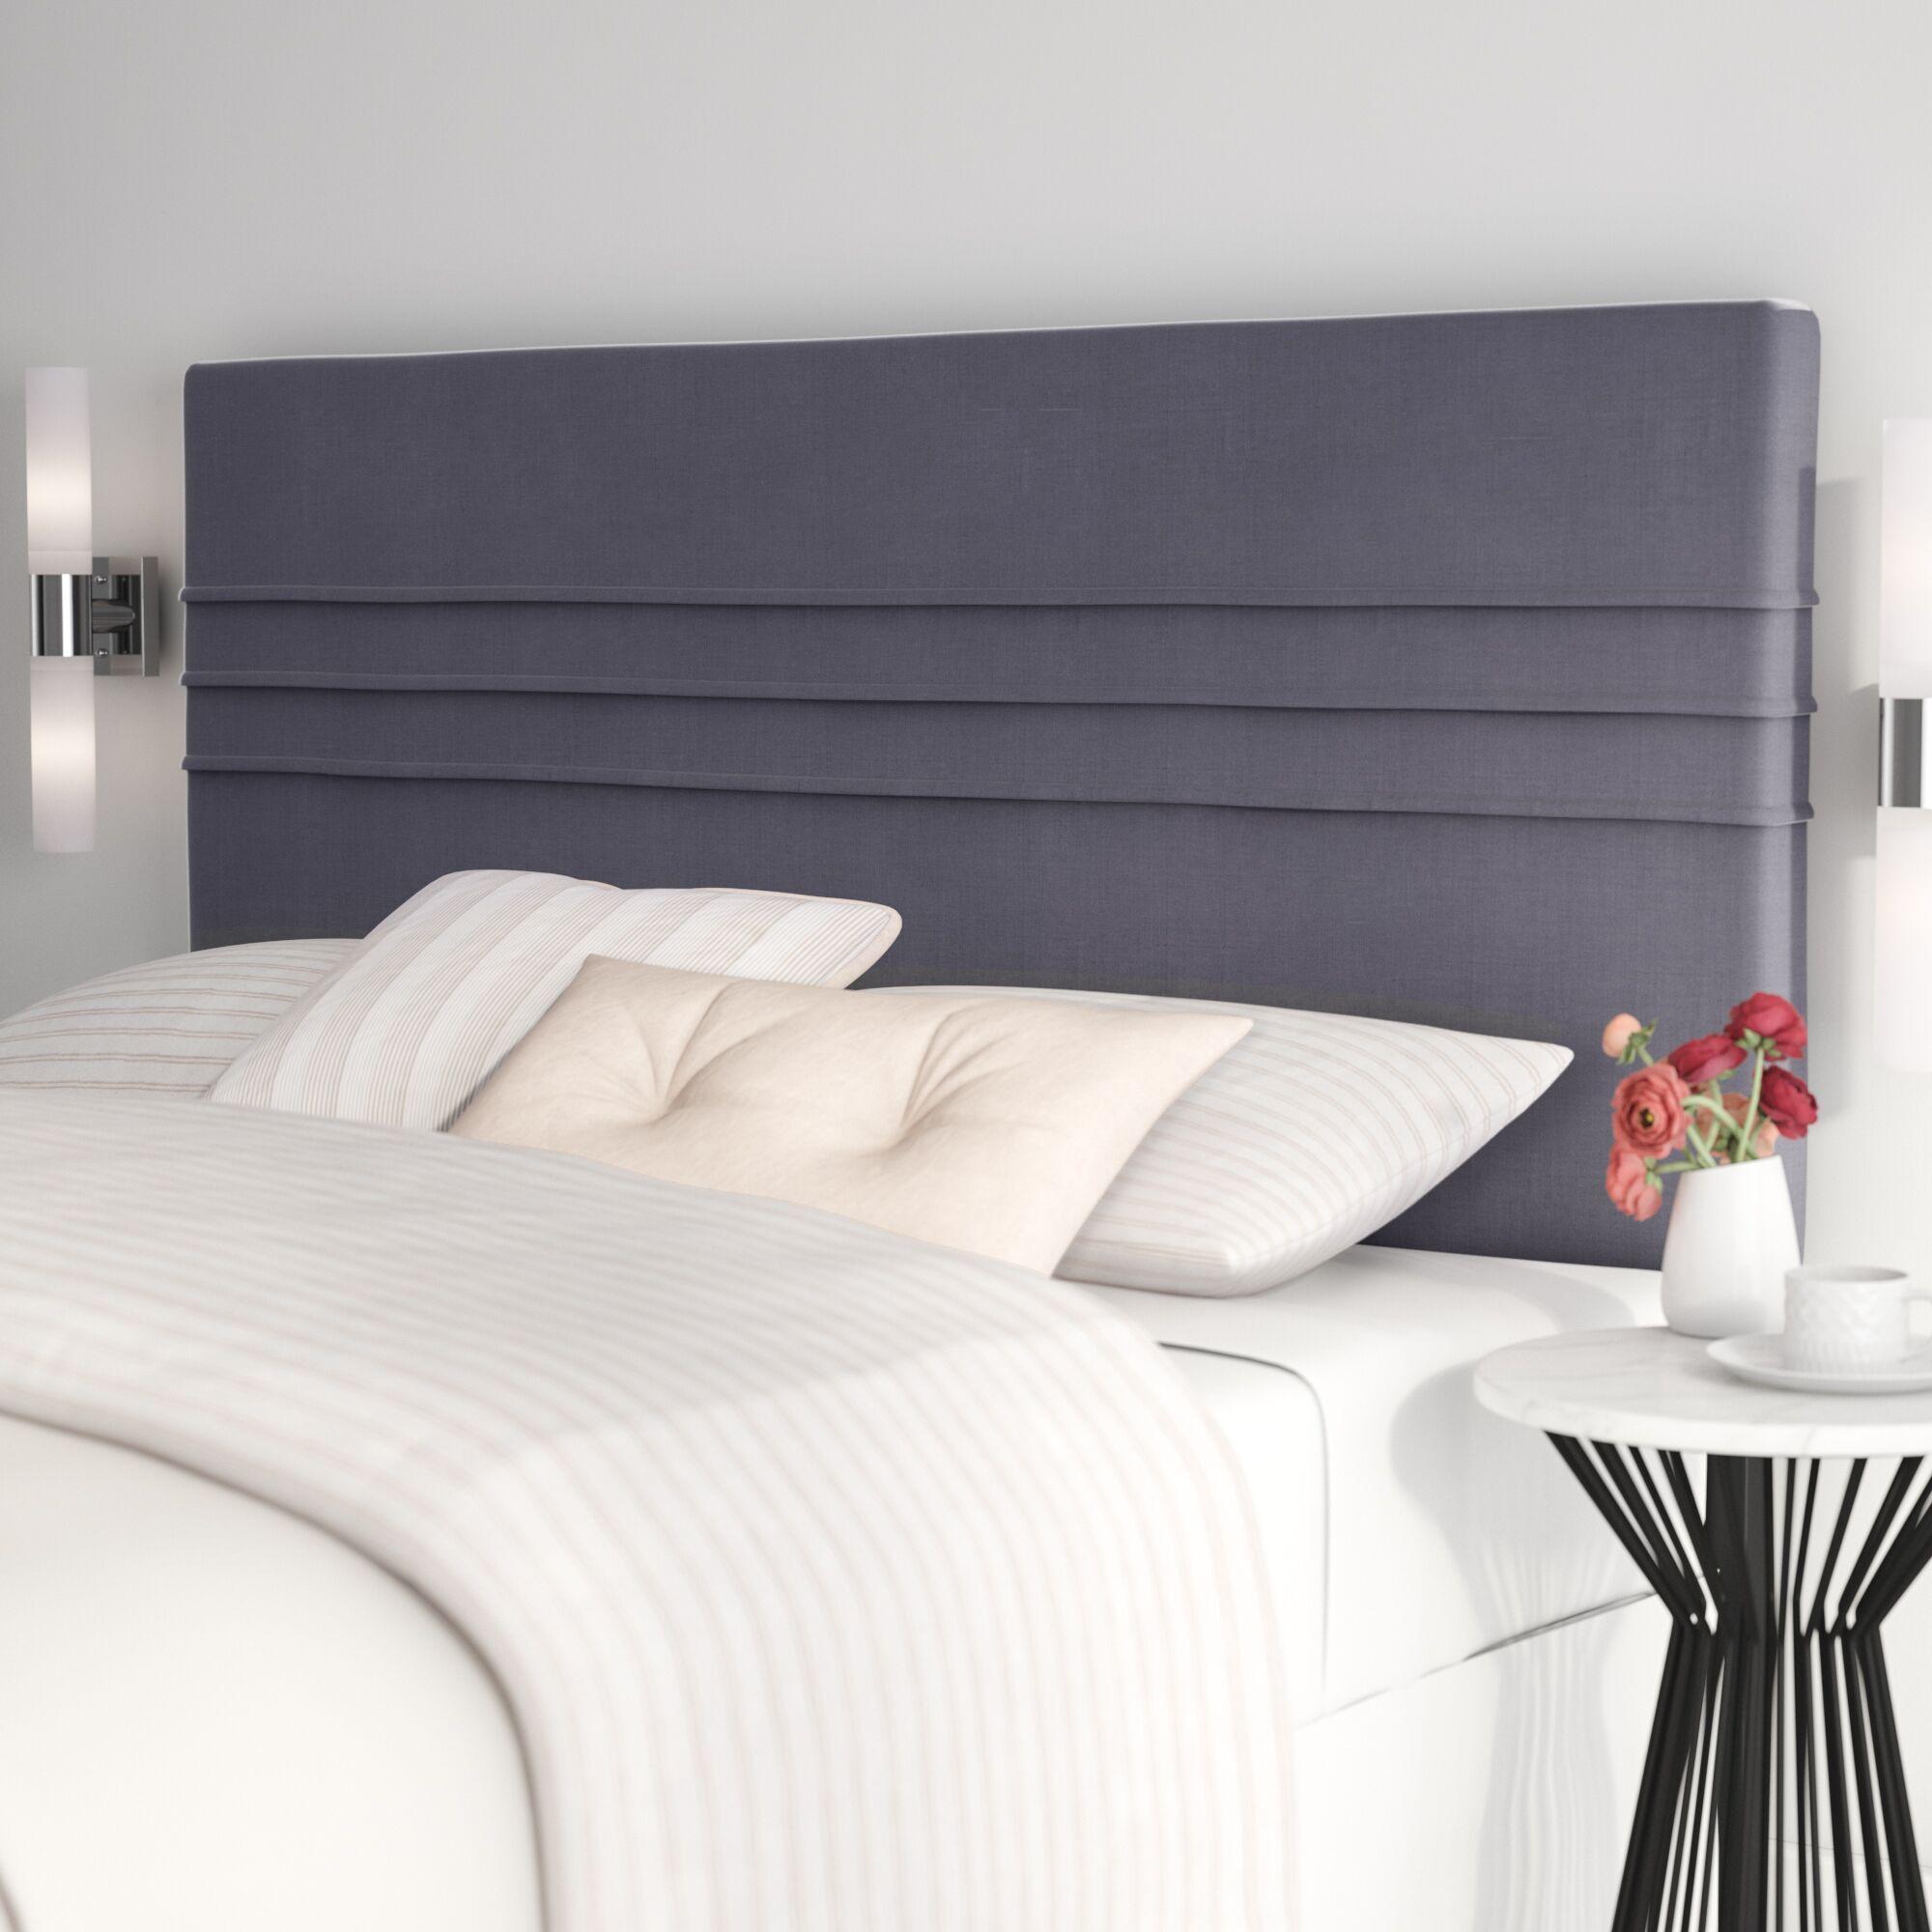 Amazonia Upholstered Panel Headboard Upholstery: Latte Dark Brown, Size: King